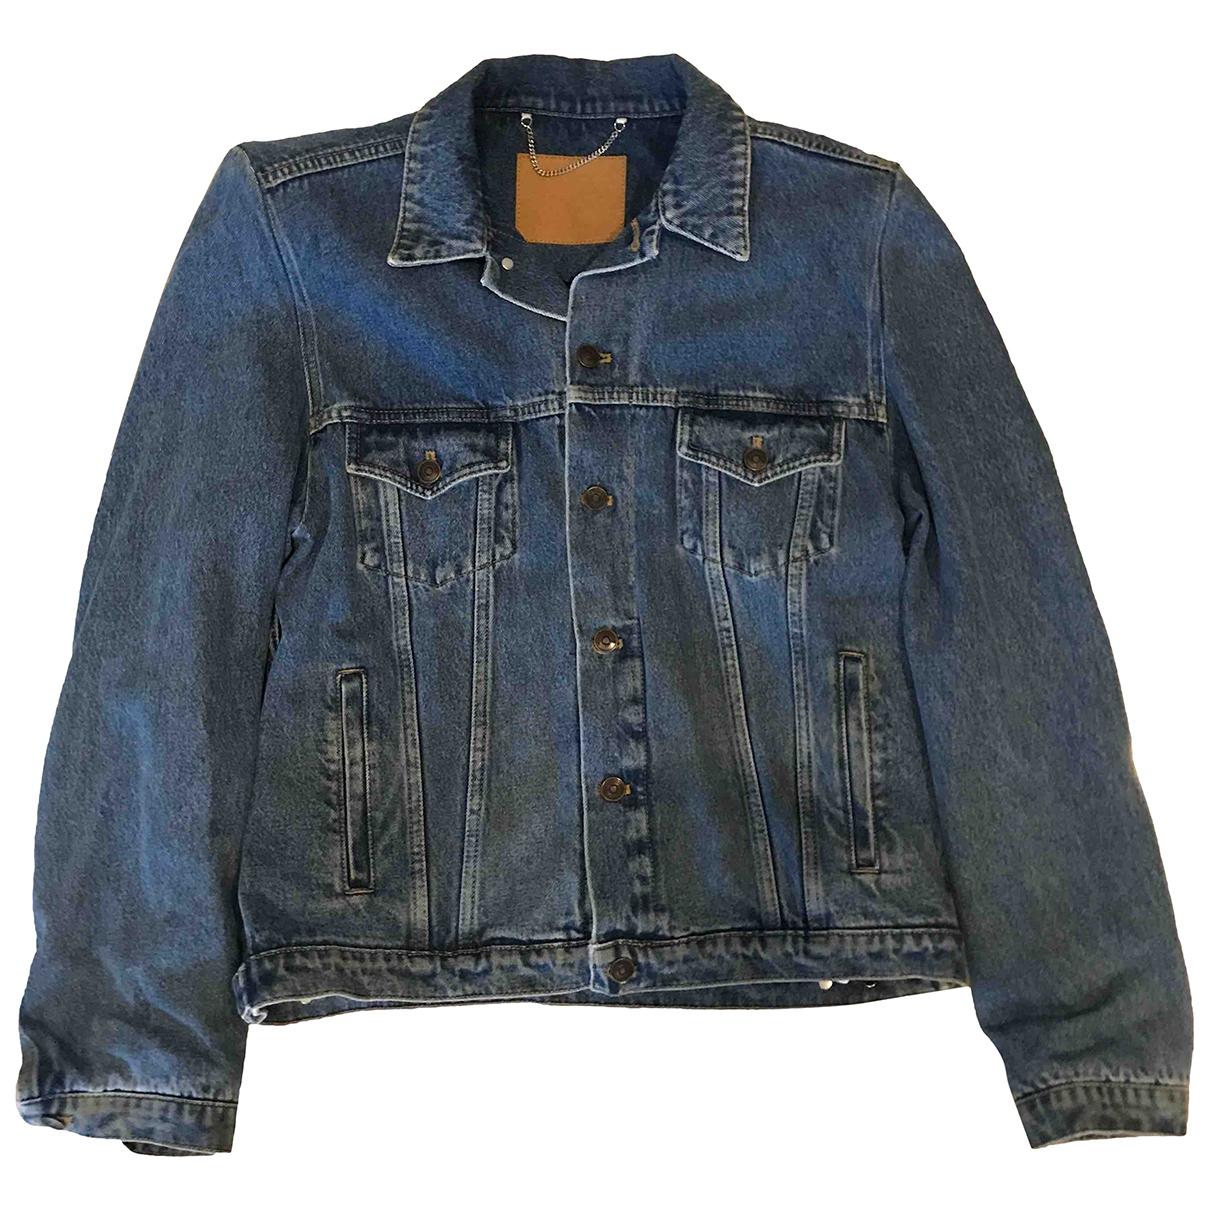 Balenciaga \N Jacke in  Blau Denim - Jeans